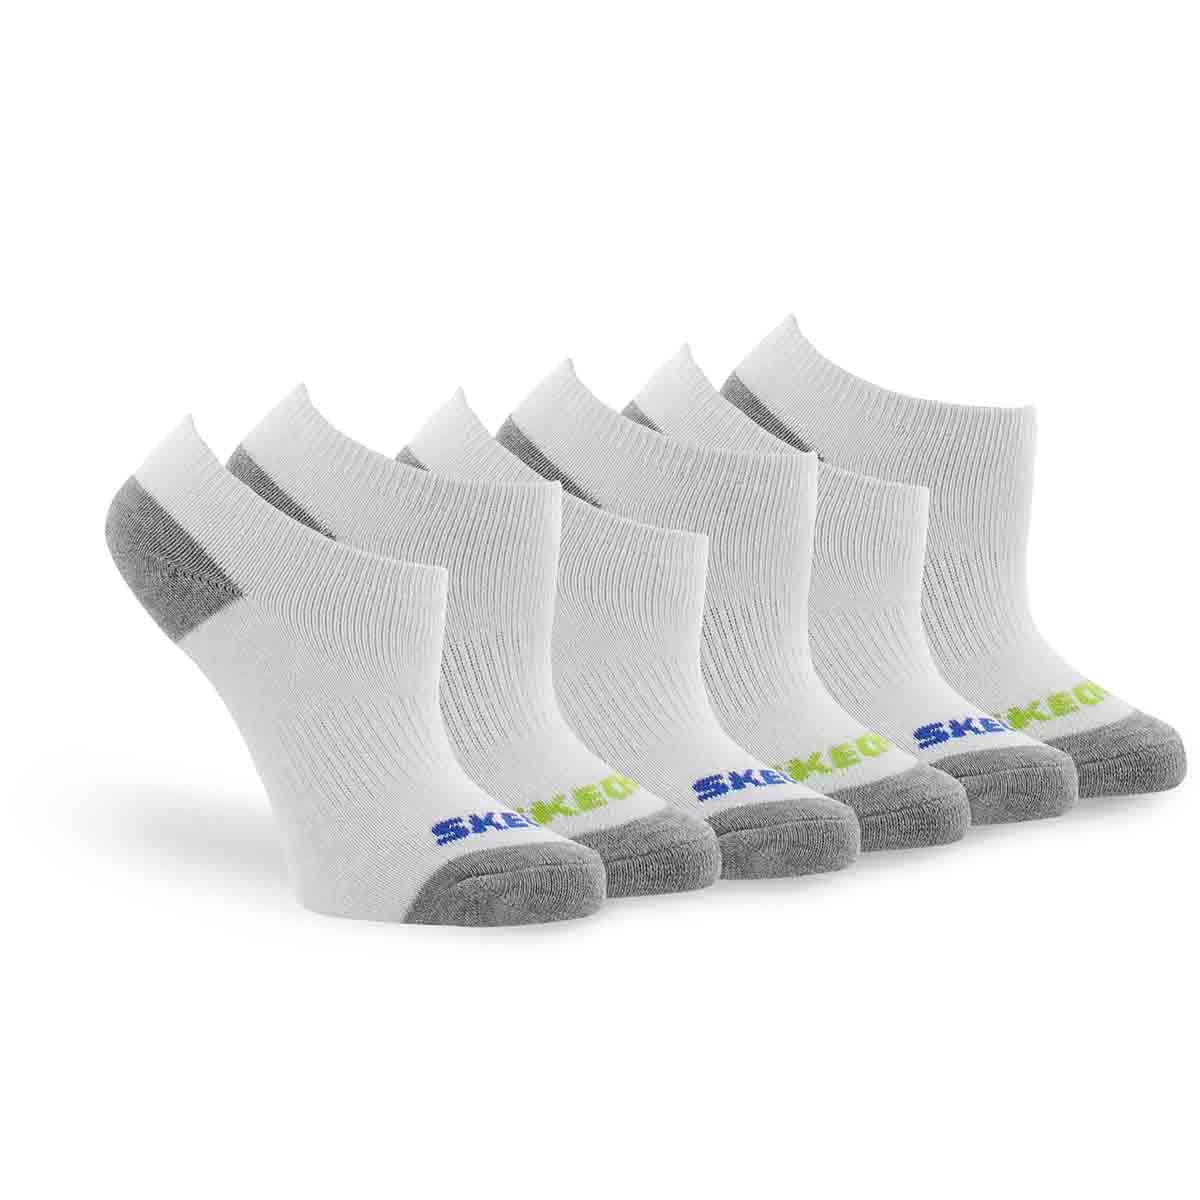 Socquettes NO SHOW FULL TERRY, blc mt, garçons-6p